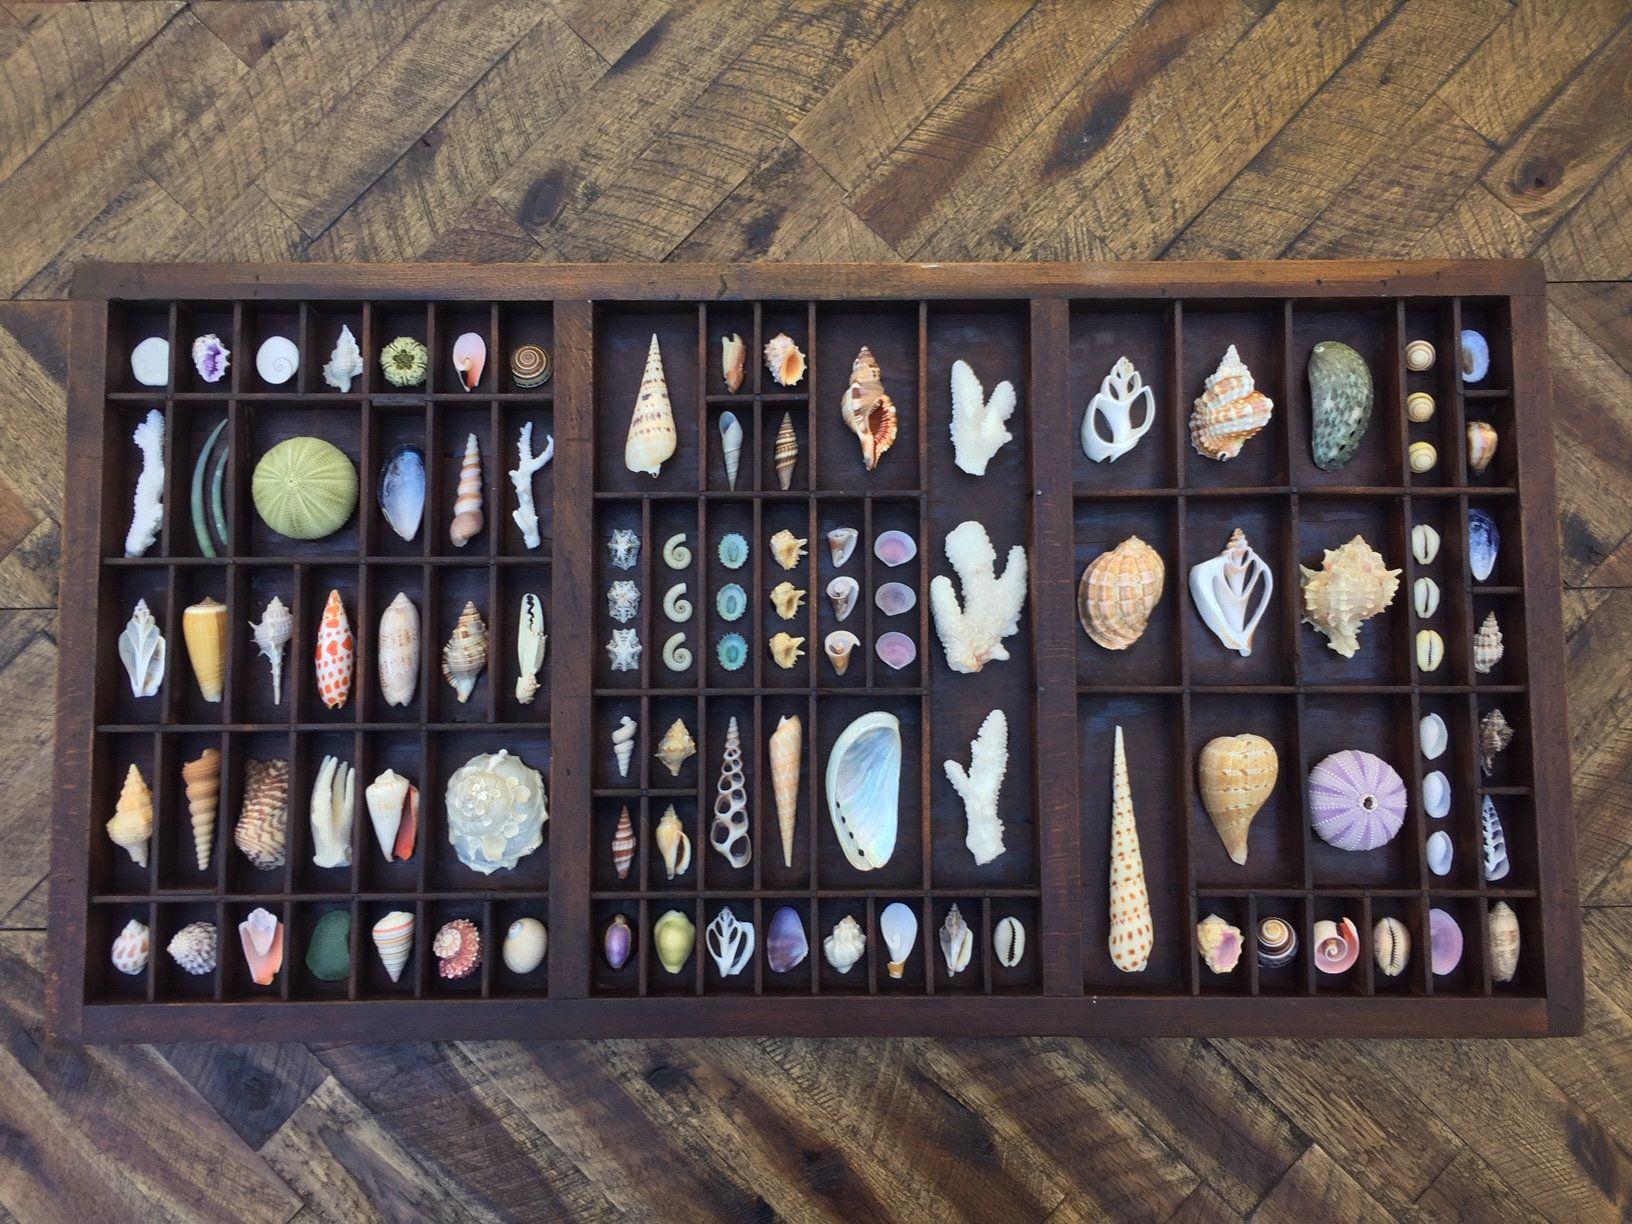 OOAK Vintage/Antique Seashell Printers Tray/Drawer Display #printertray